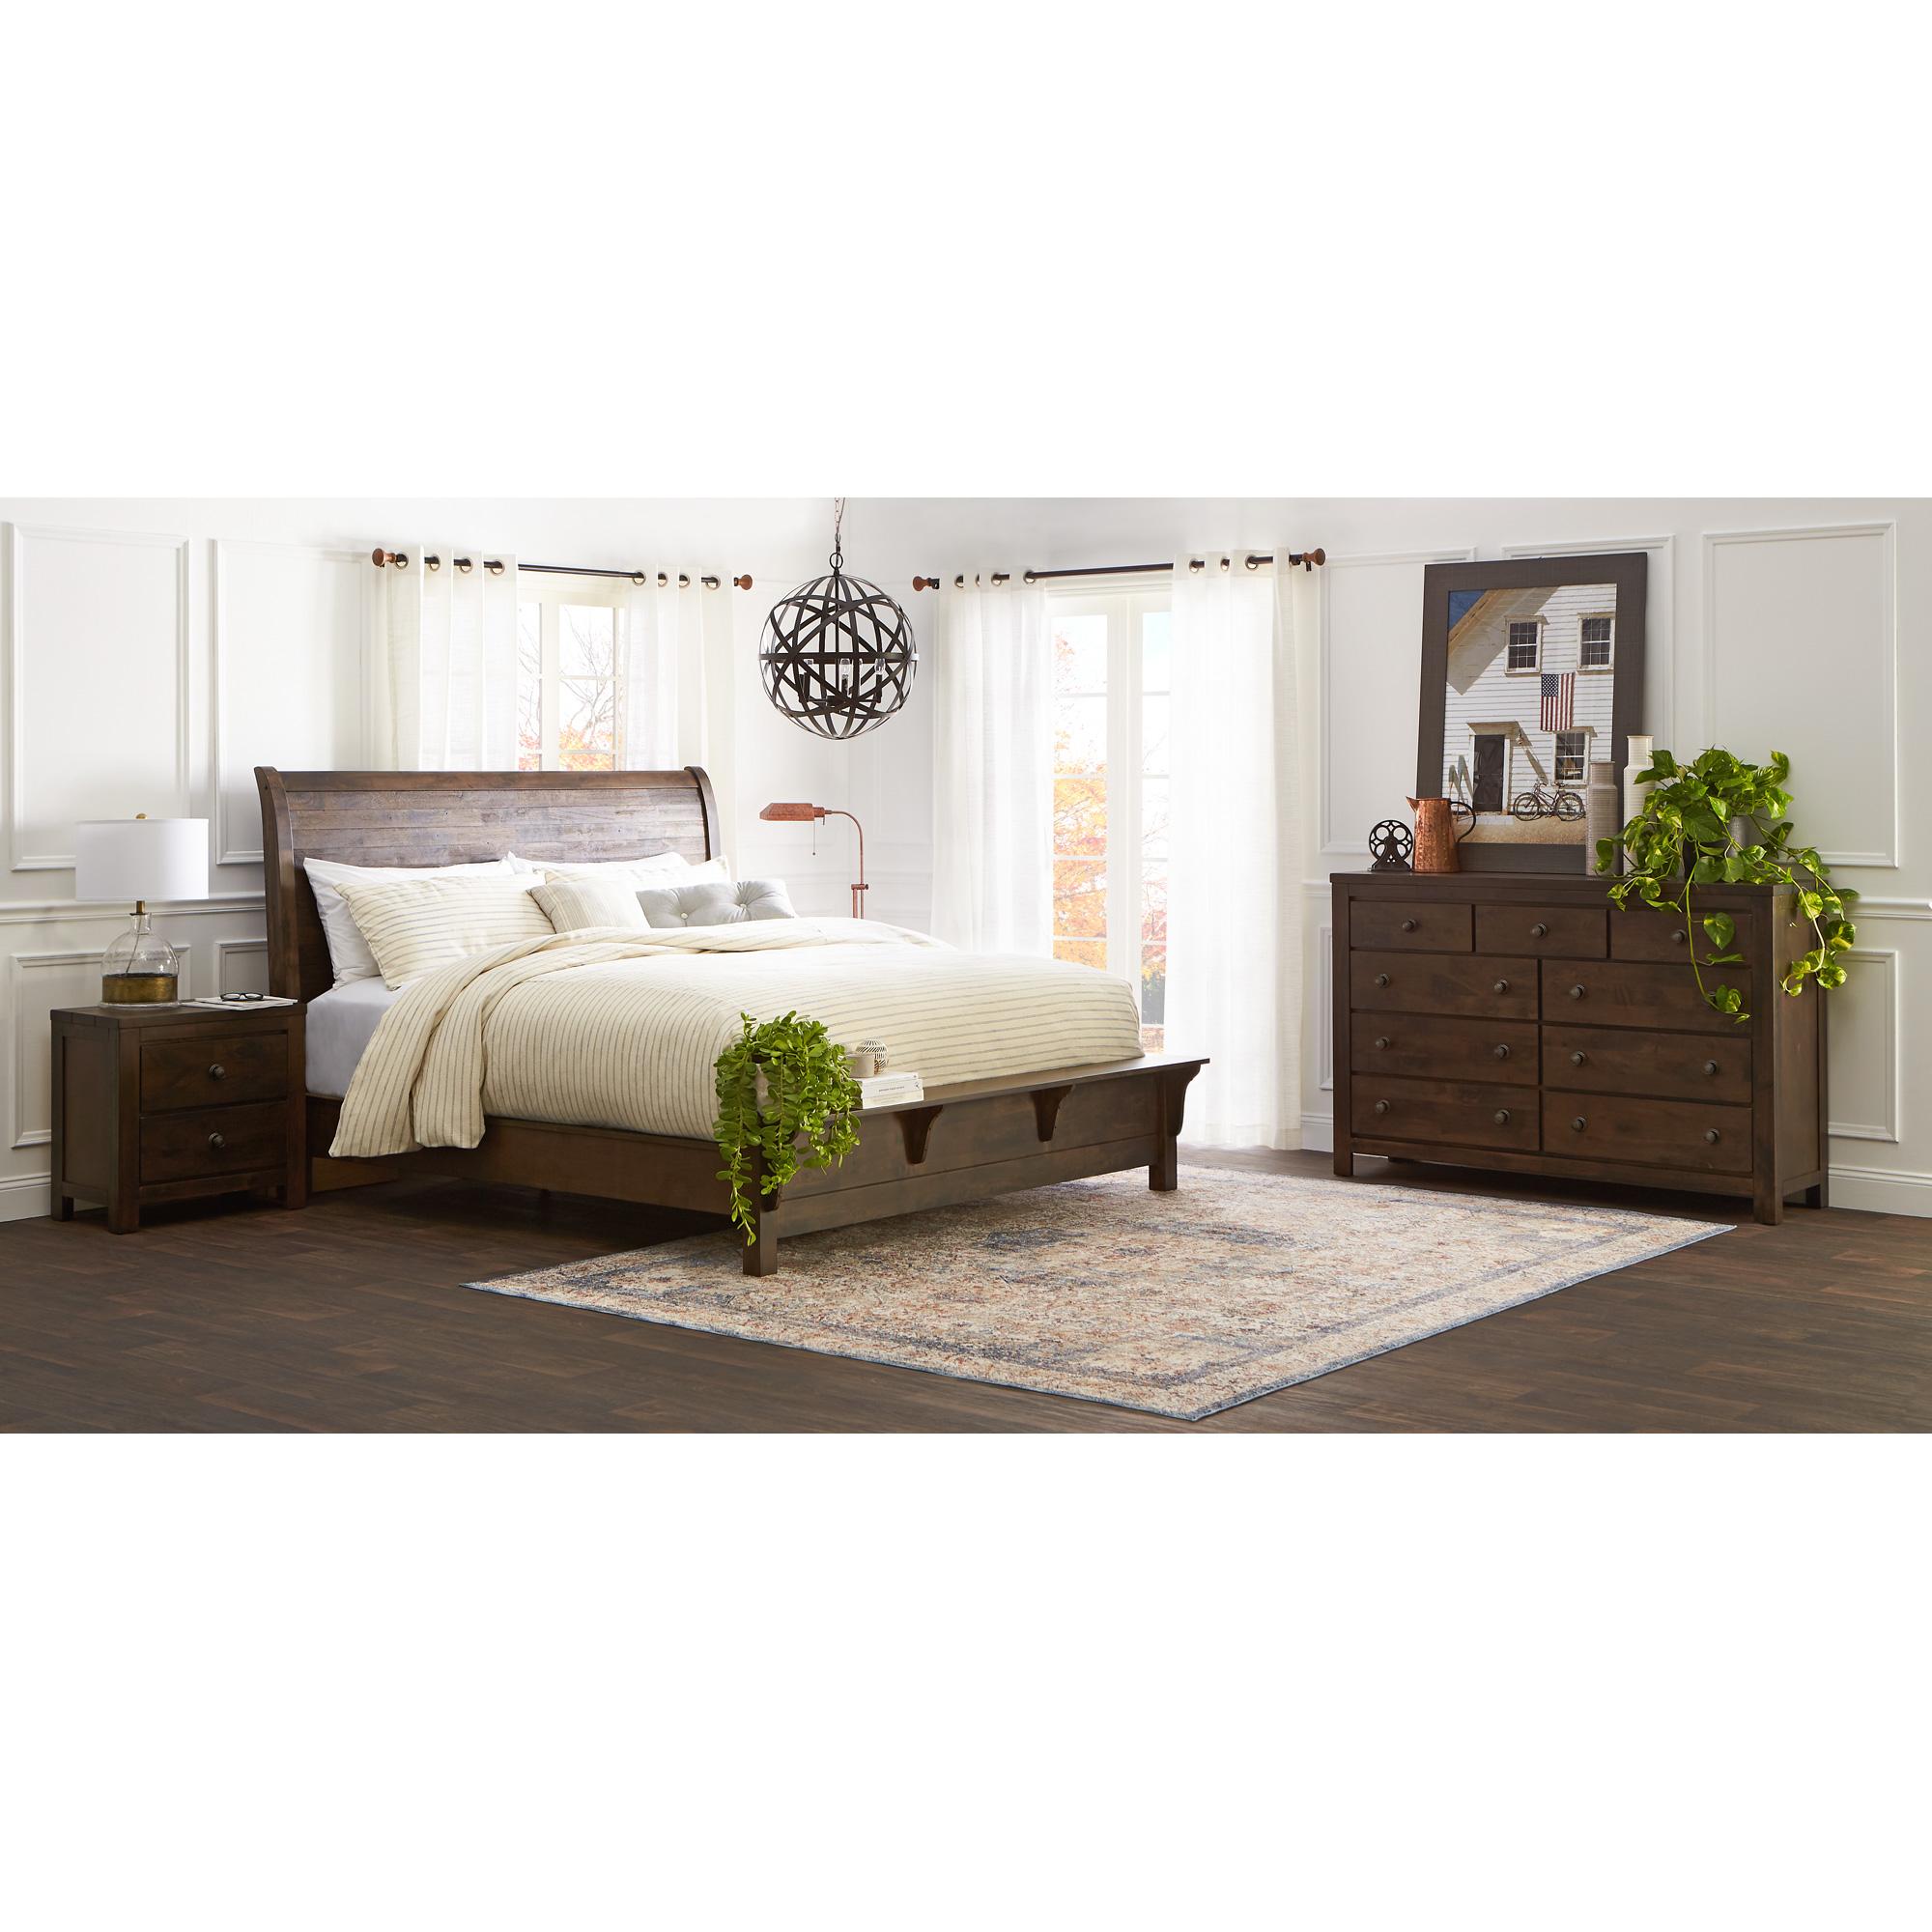 New Classic | Blue Ridge Rustic Gray King 4 Piece Room Group Bedroom Set